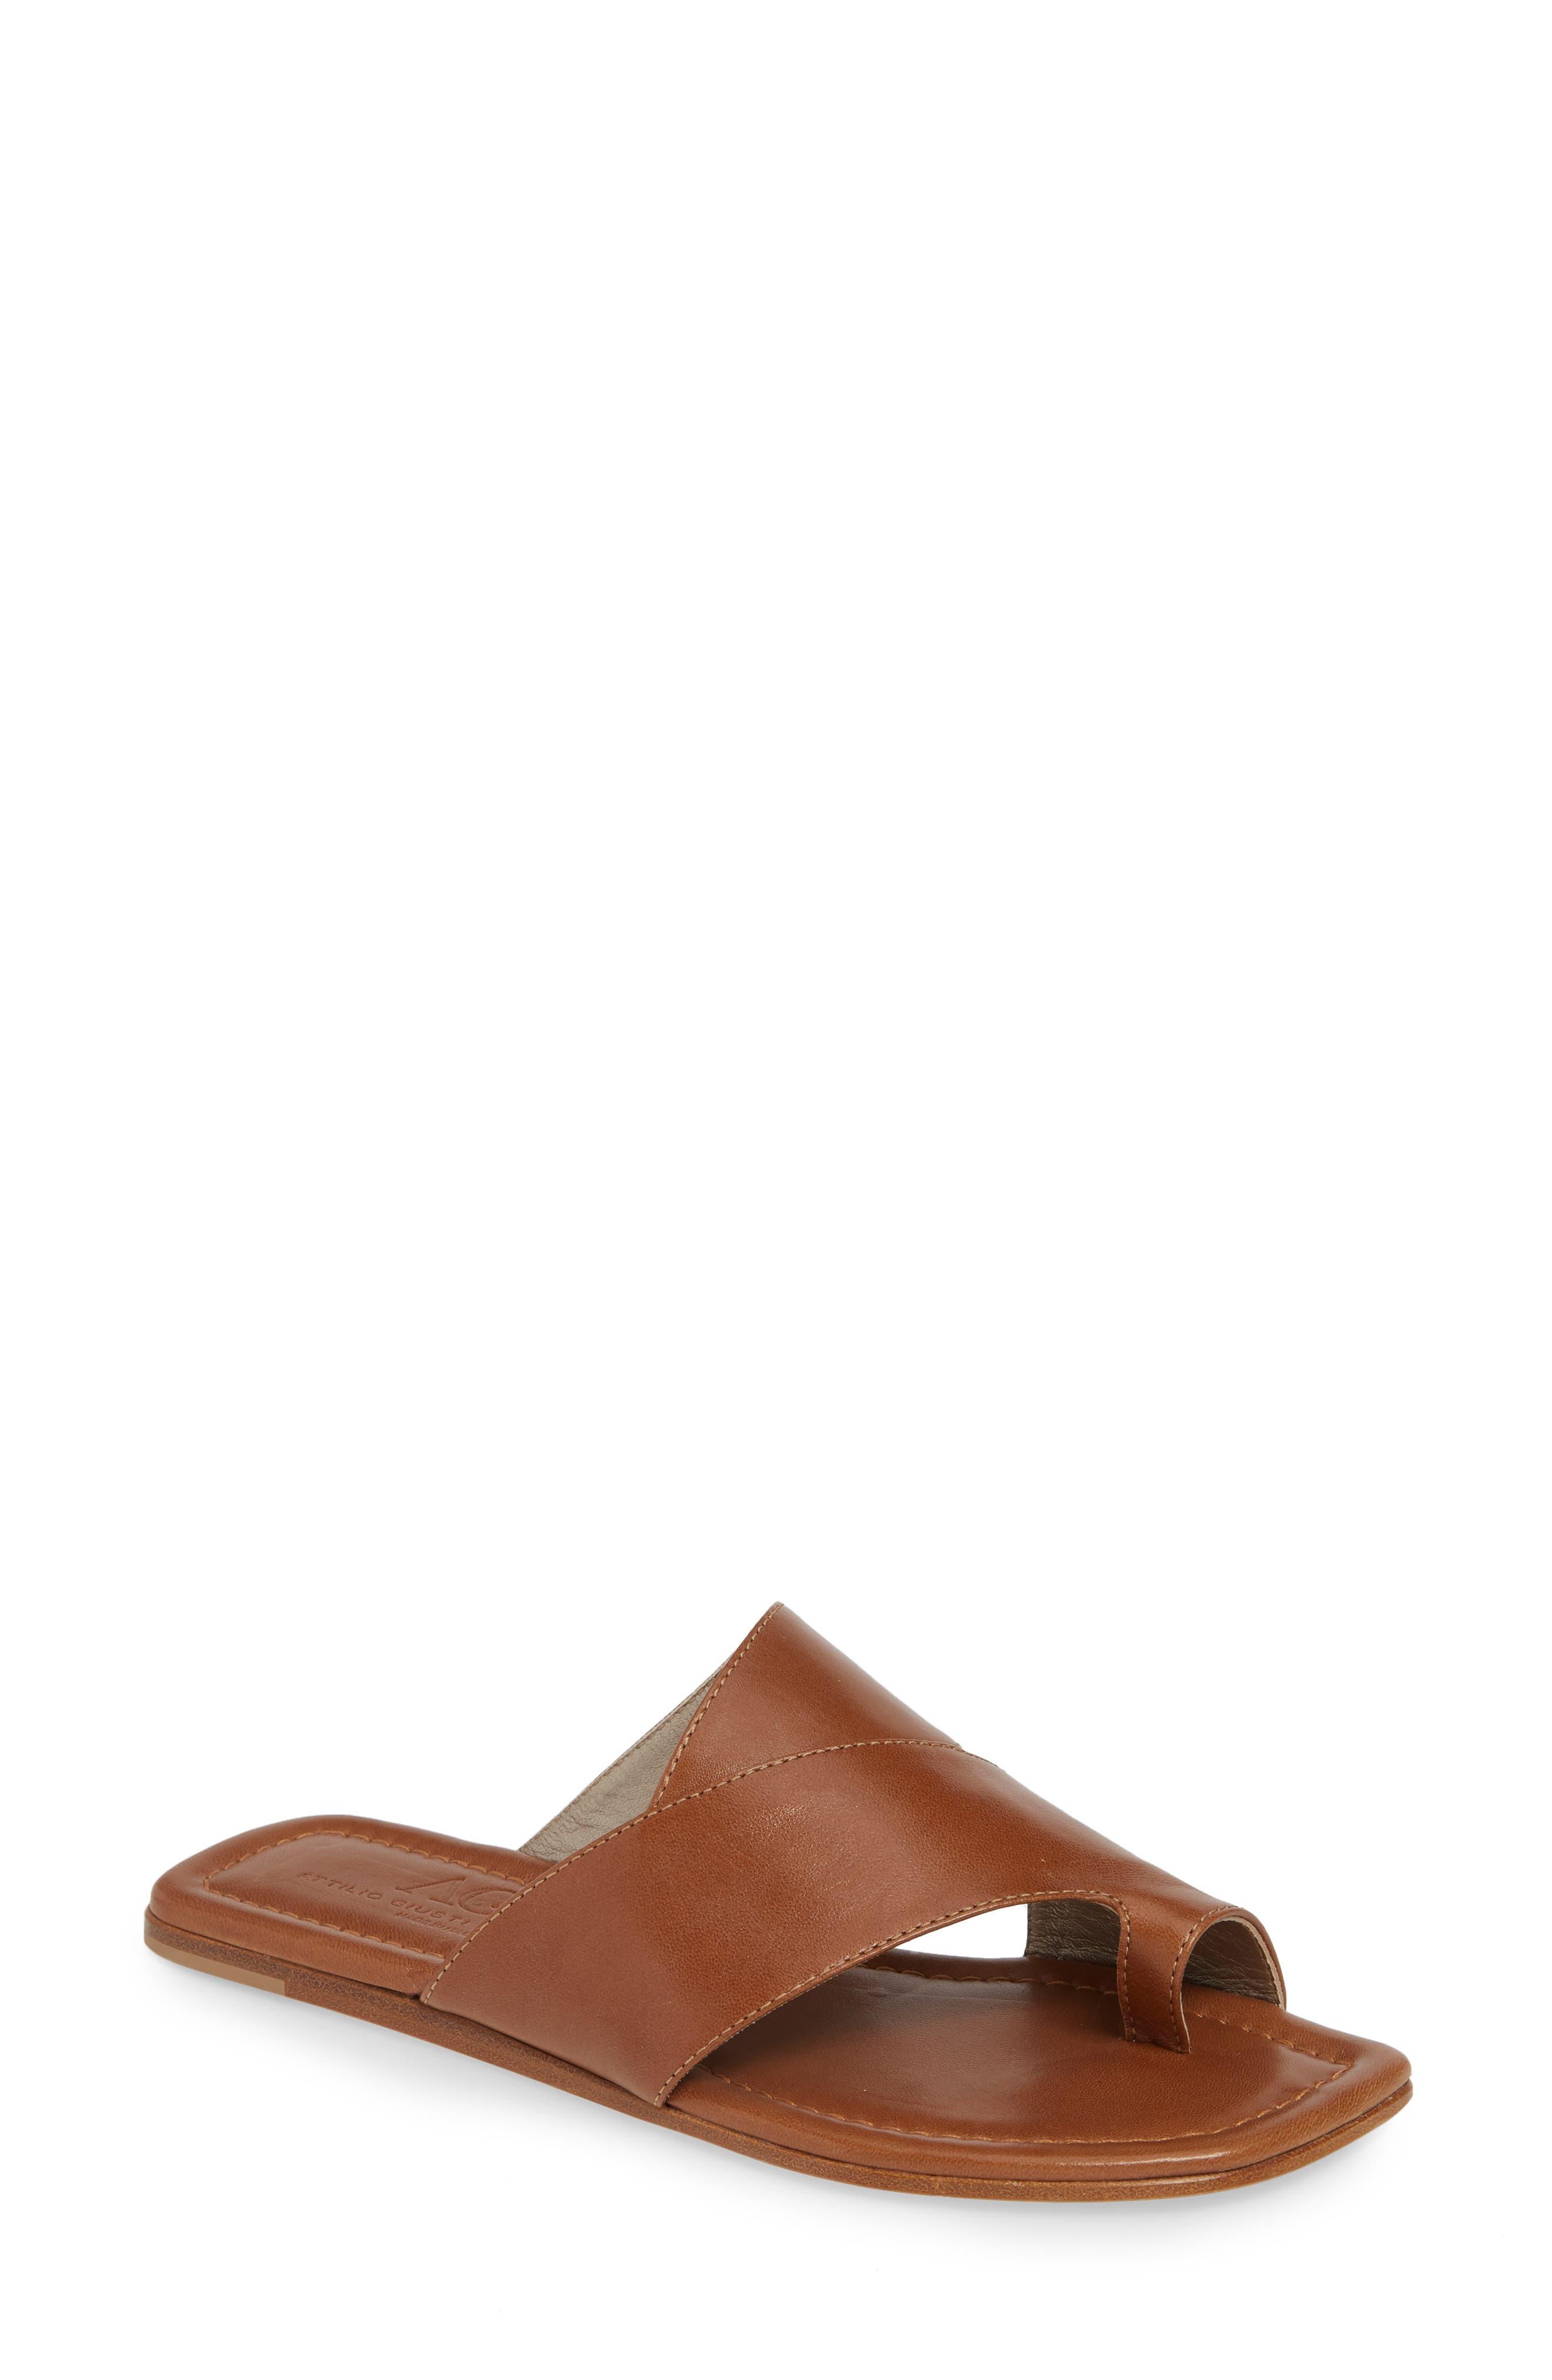 7c2b3f835b2 attilio giusti leombruni sandals for women